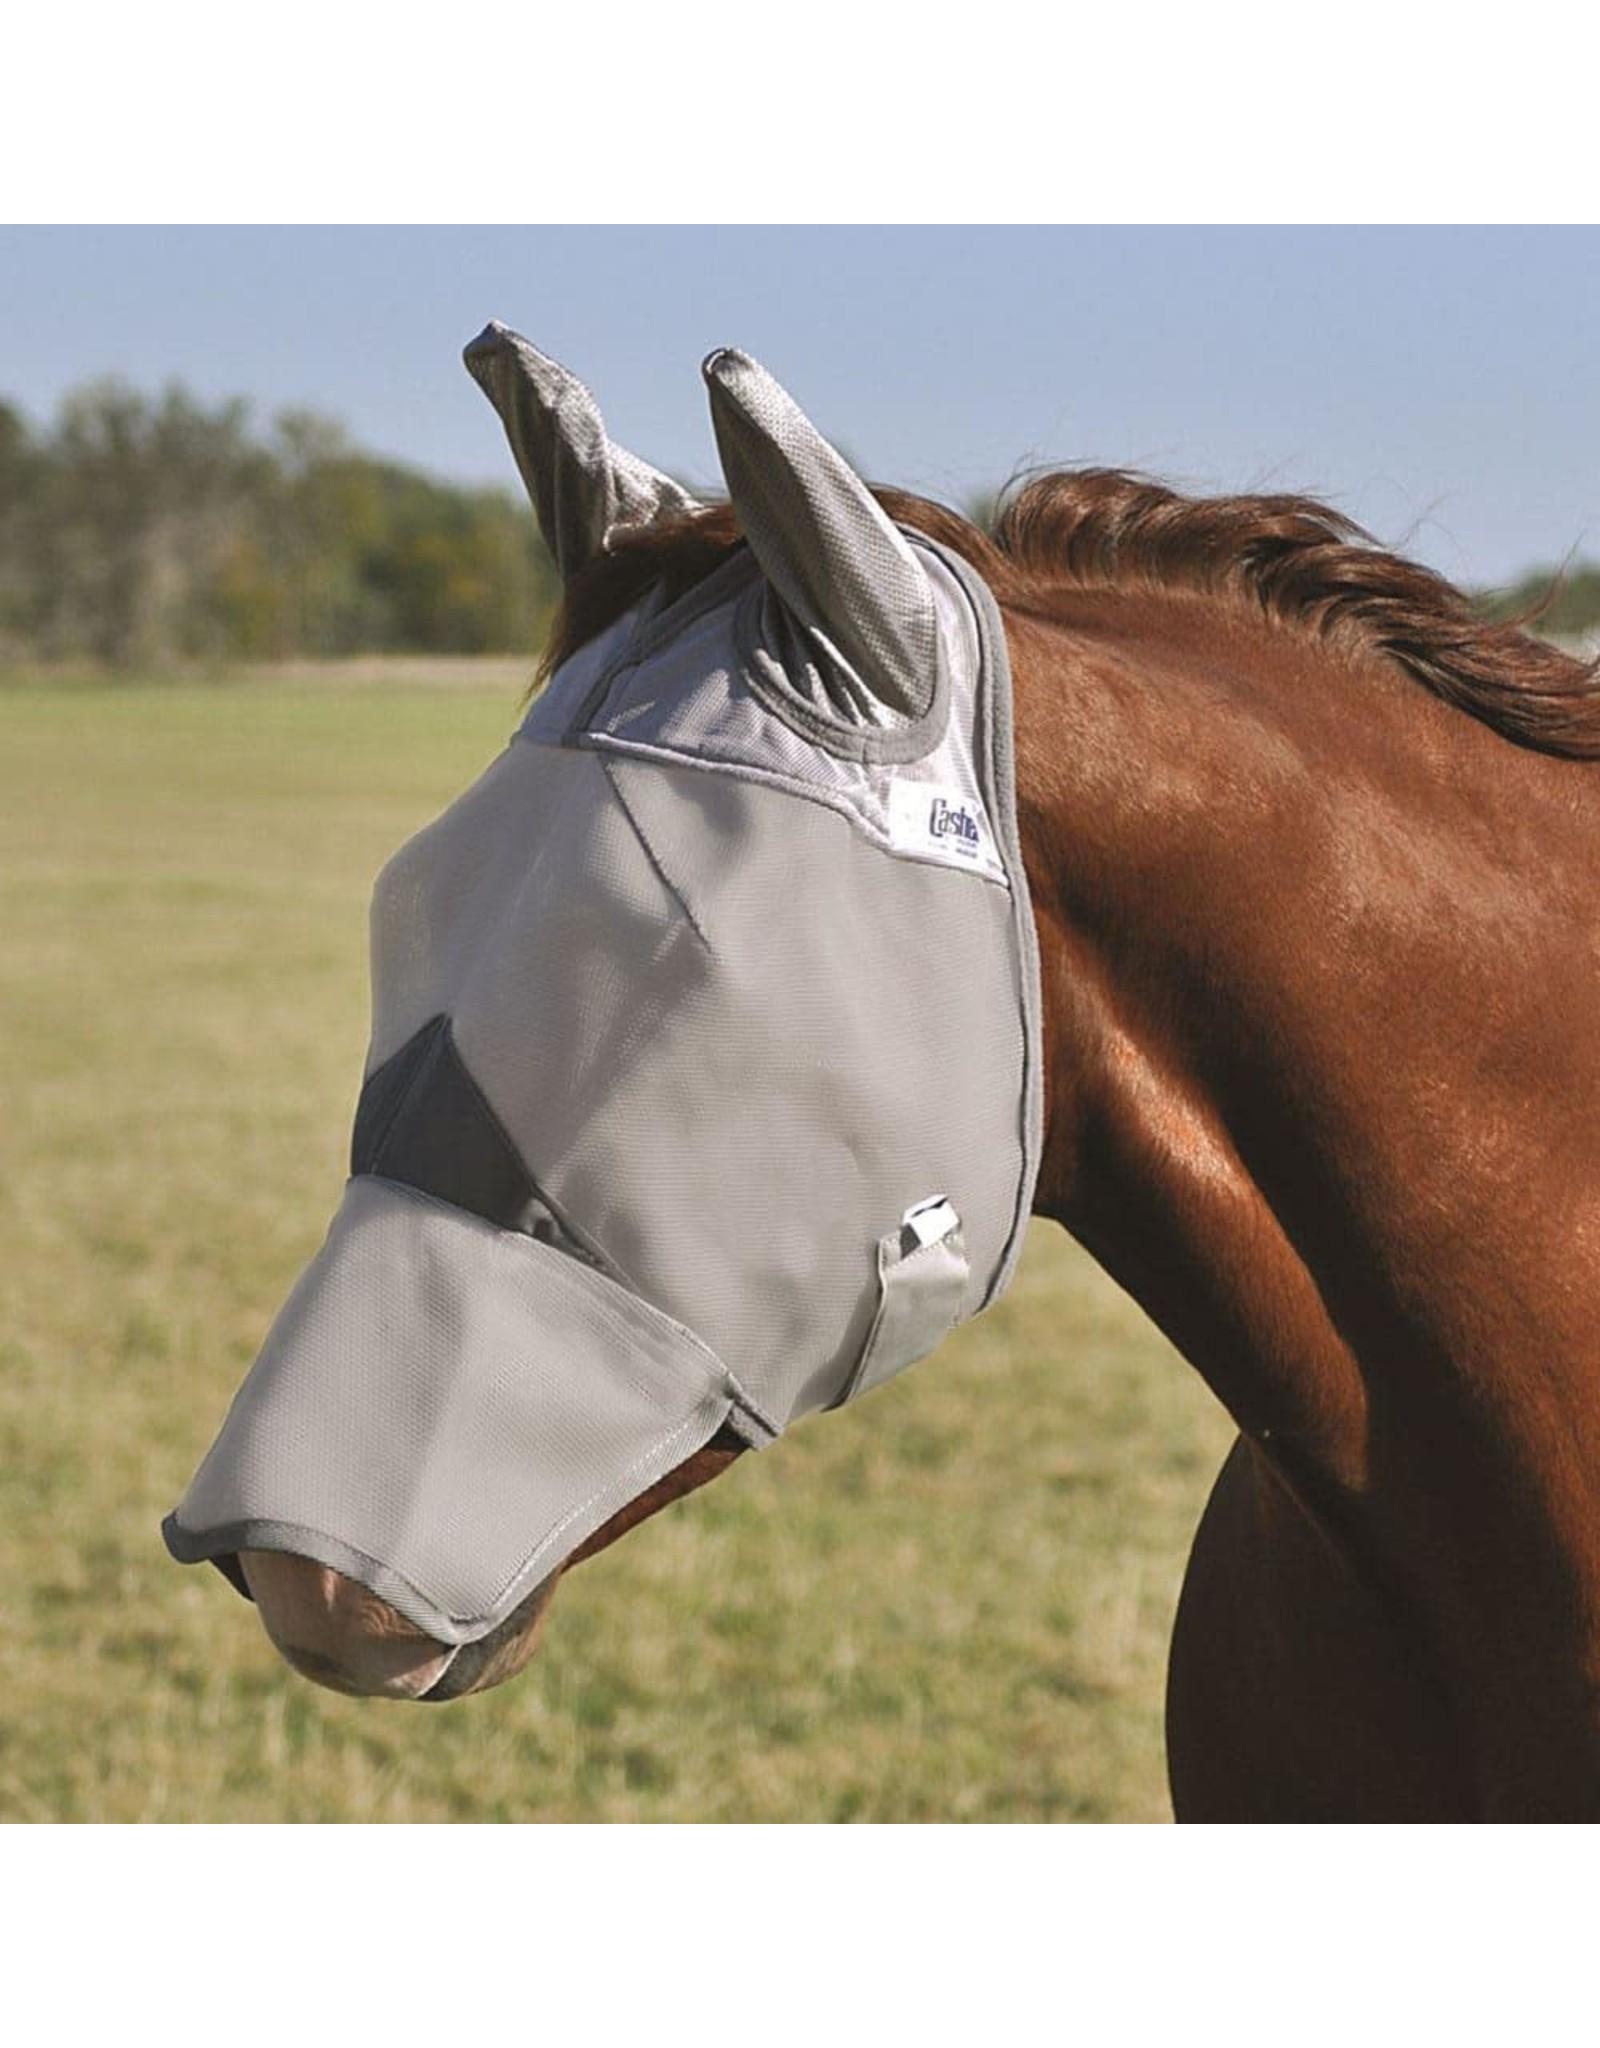 Cashel Crusader Fly Mask Long Nose w/ Ears